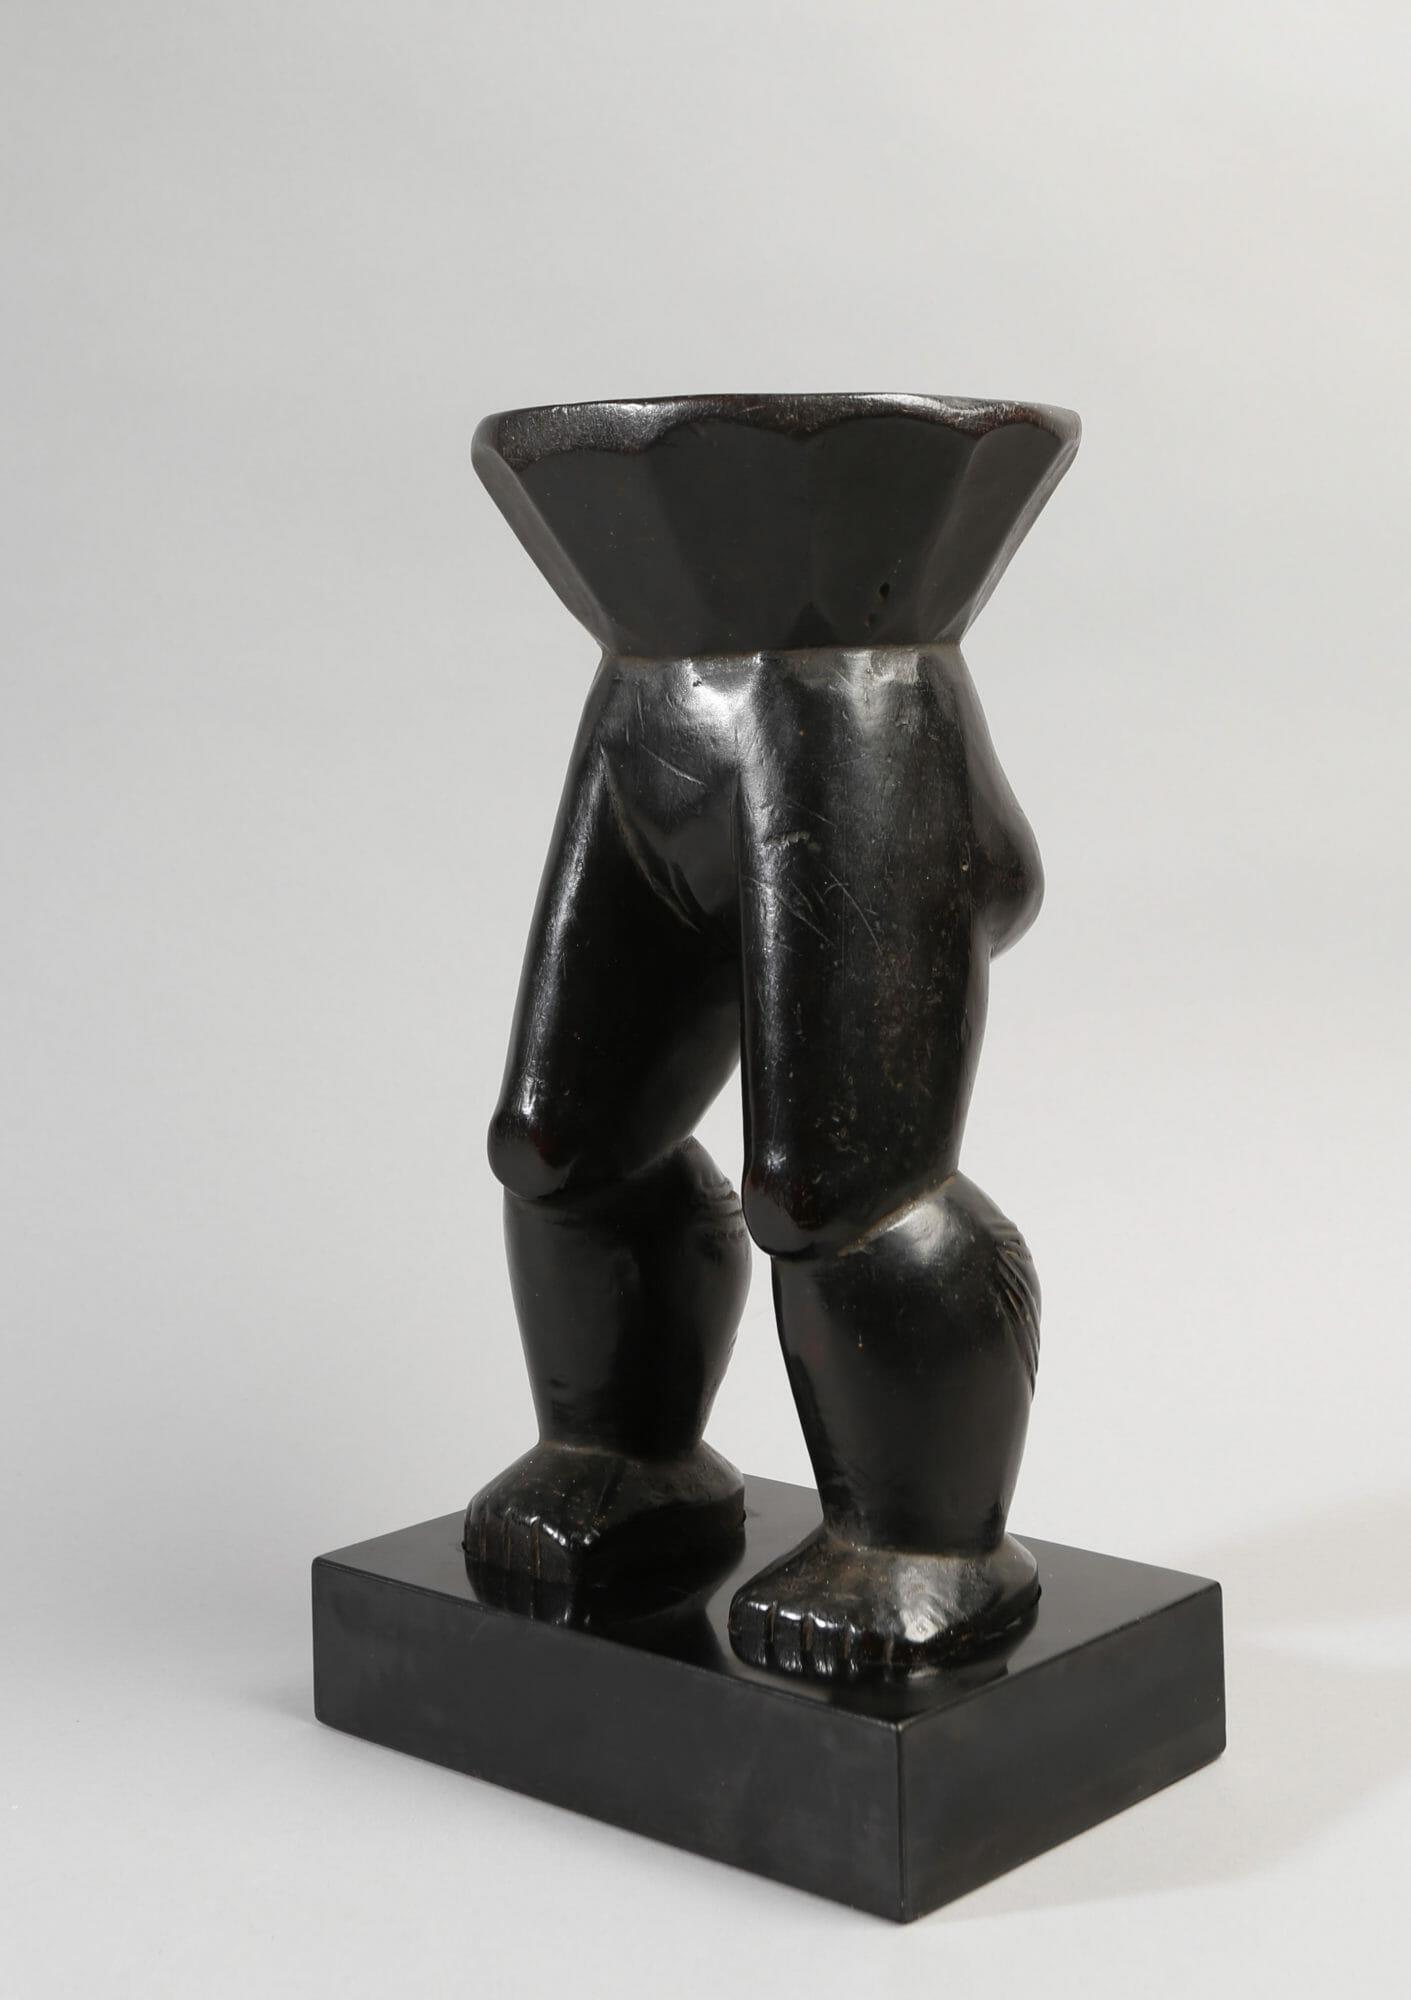 Galerie Jean-Baptiste Bacquart